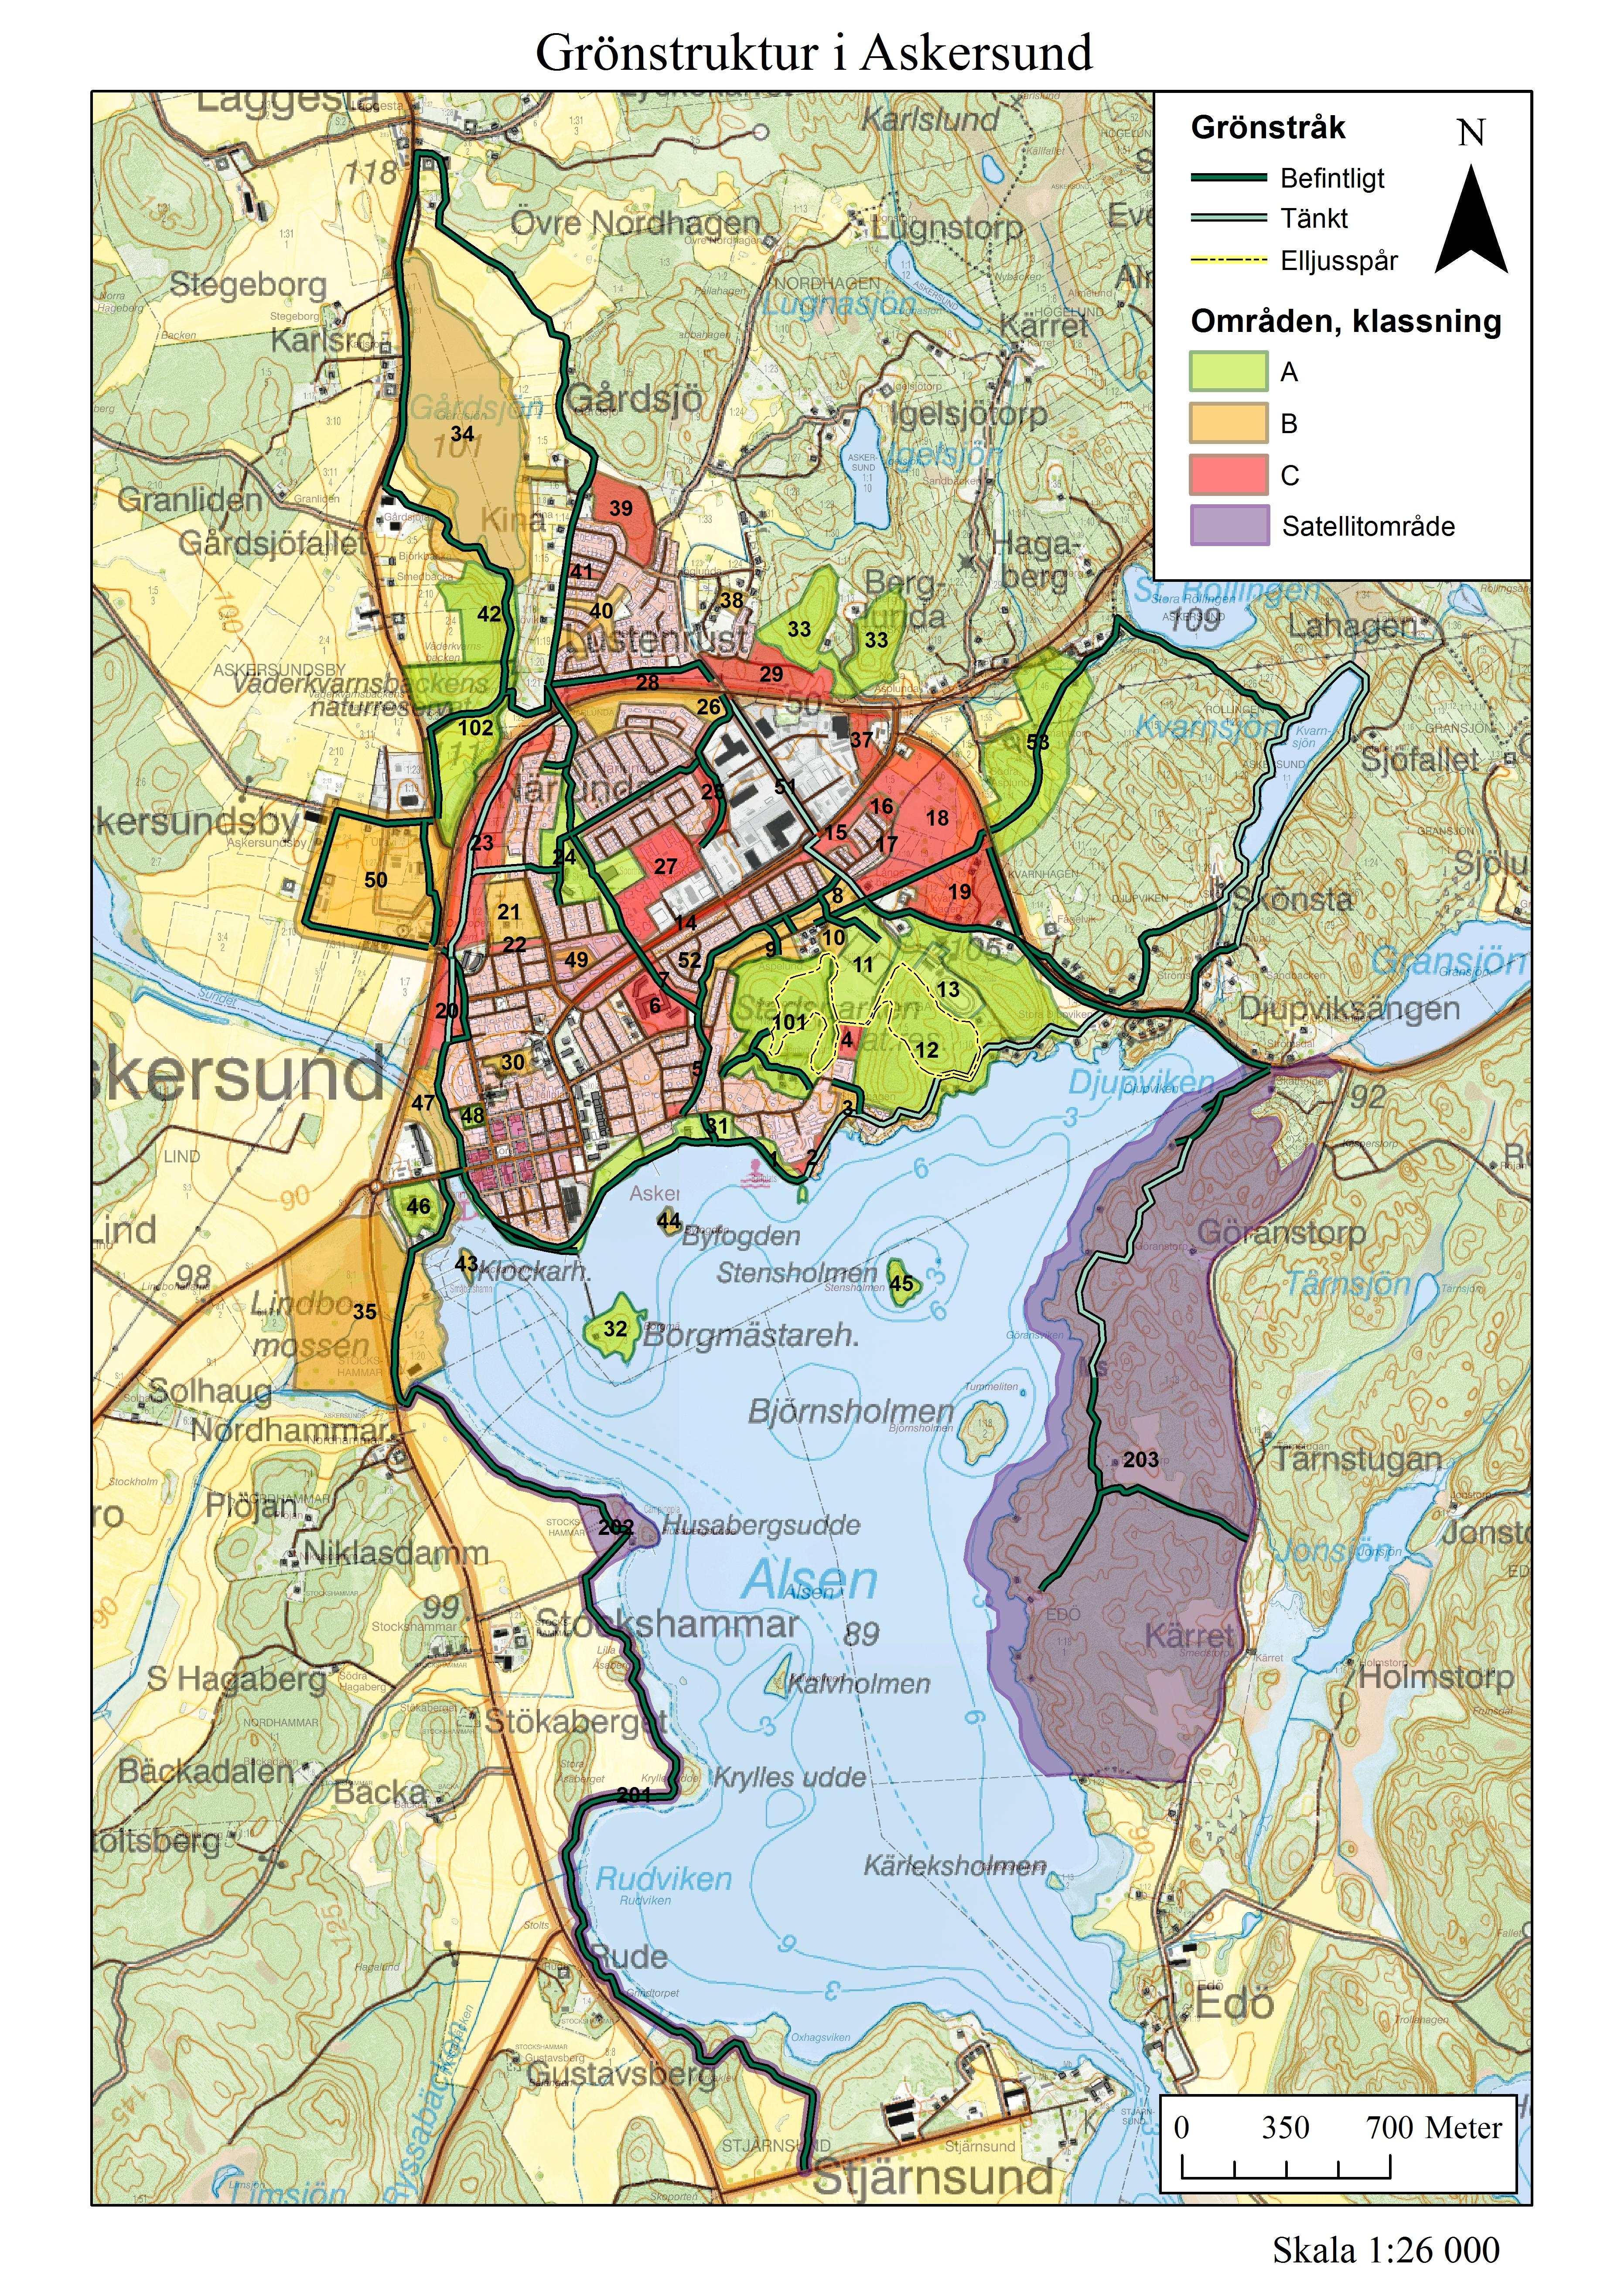 askersund karta Grönstruktur i Askersund   Sydnärkes miljöförvaltning askersund karta